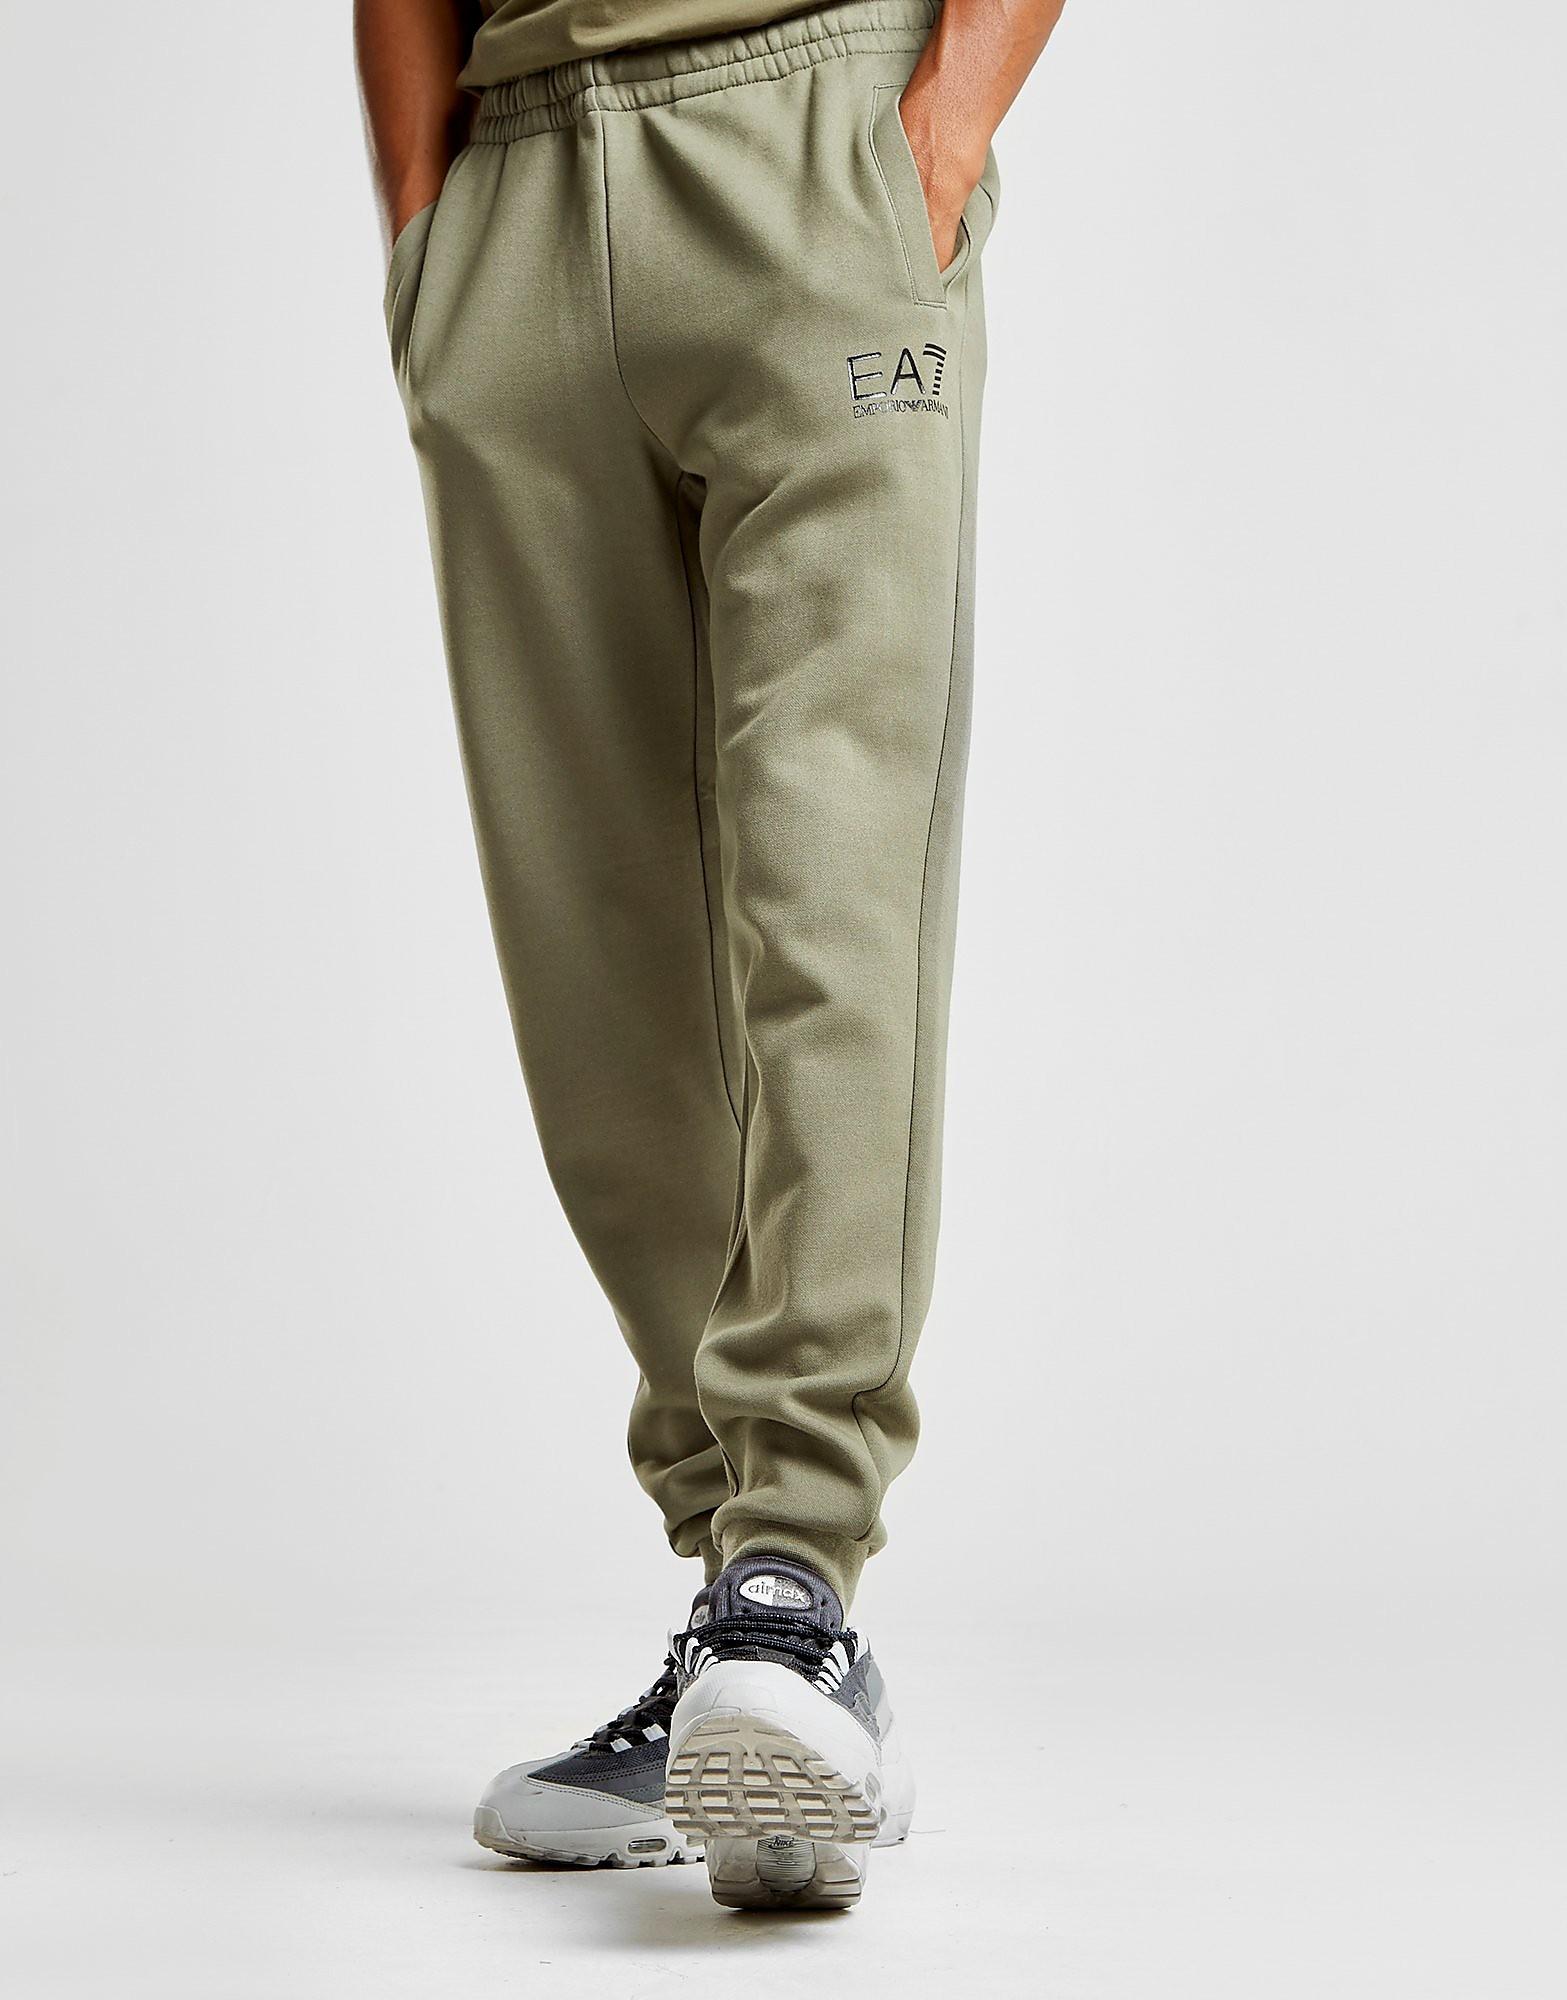 Emporio Armani EA7 Double Knit Pants